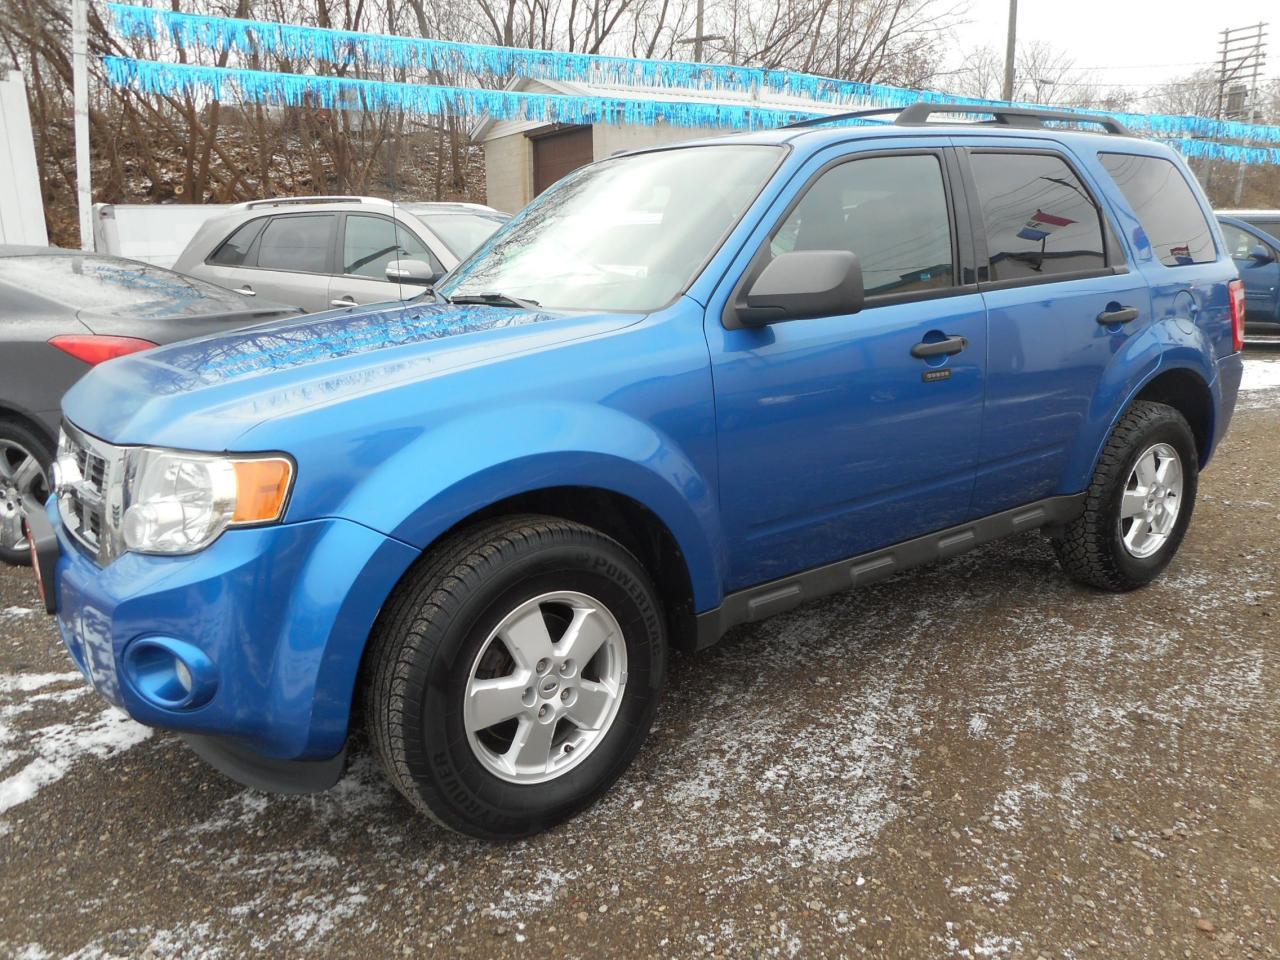 2011 Ford Escape XLT - Certified w/ 6 Month Warranty